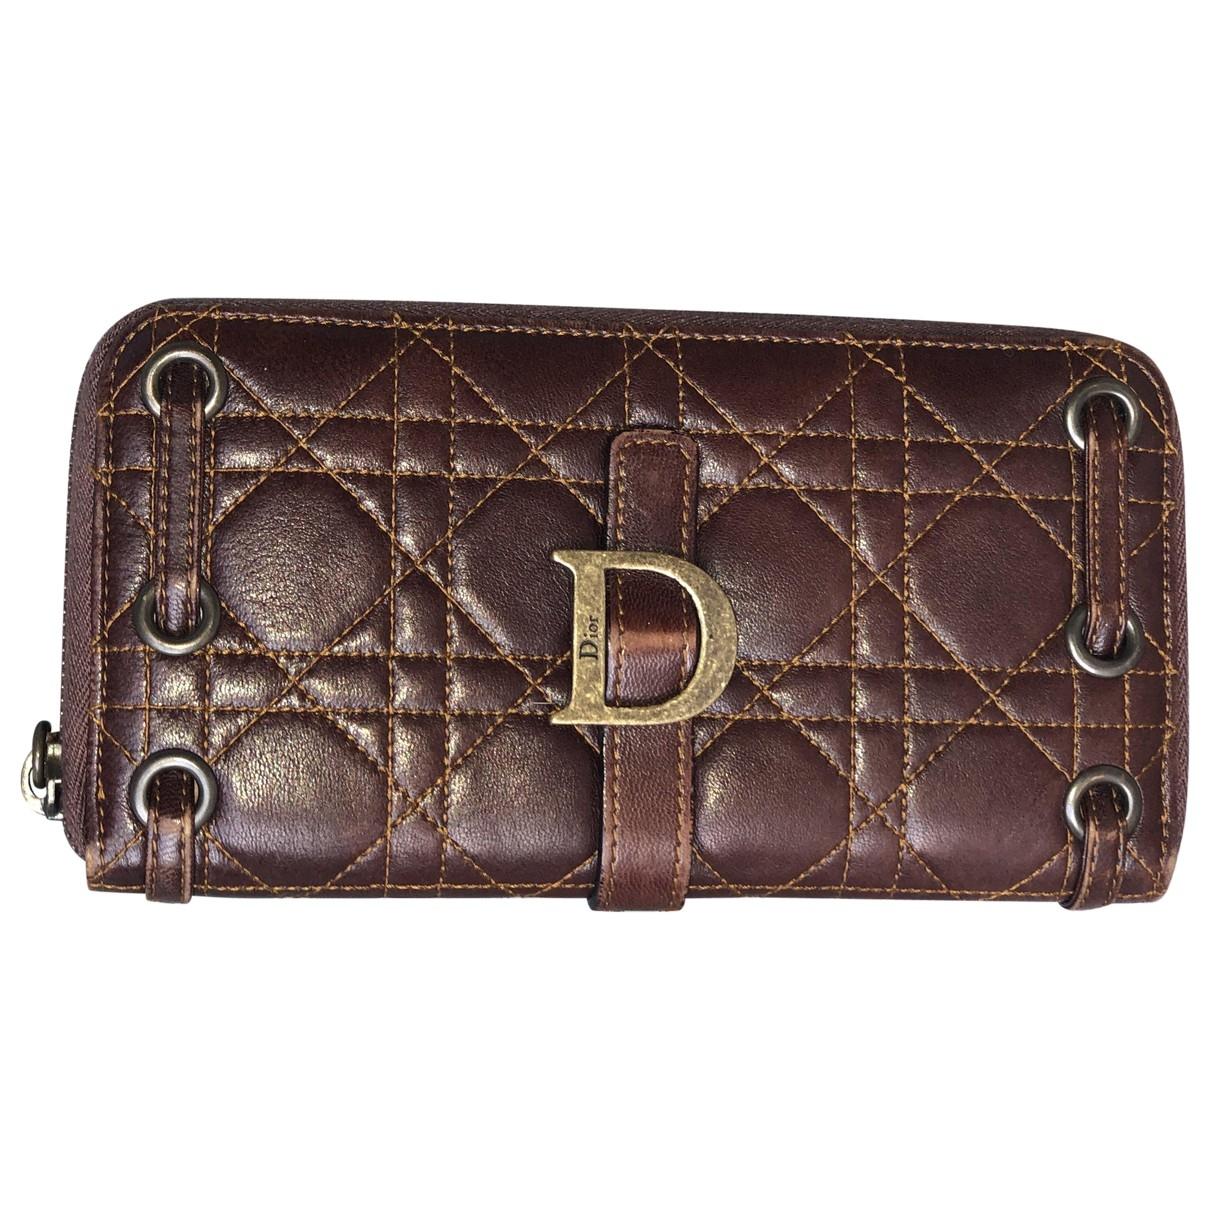 Dior \N Portemonnaie in  Braun Leder